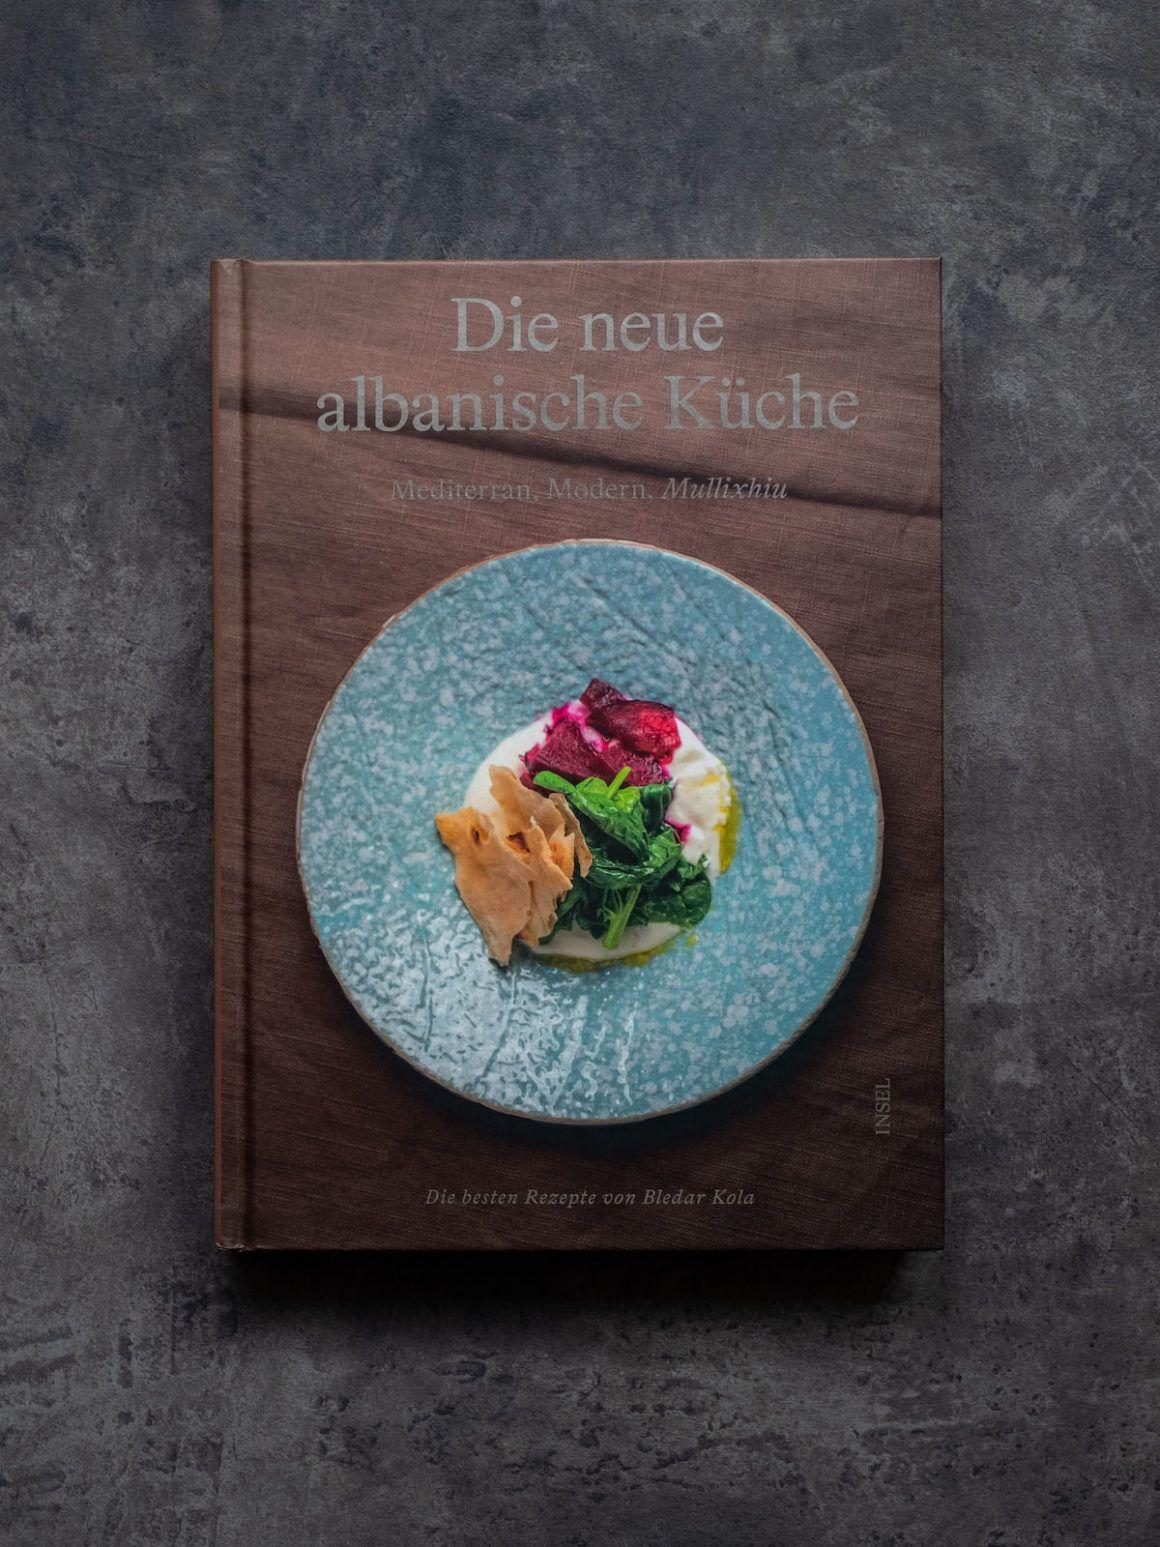 Leckerbissen About Fuel Foodblog Bledar Kola Kochbuch